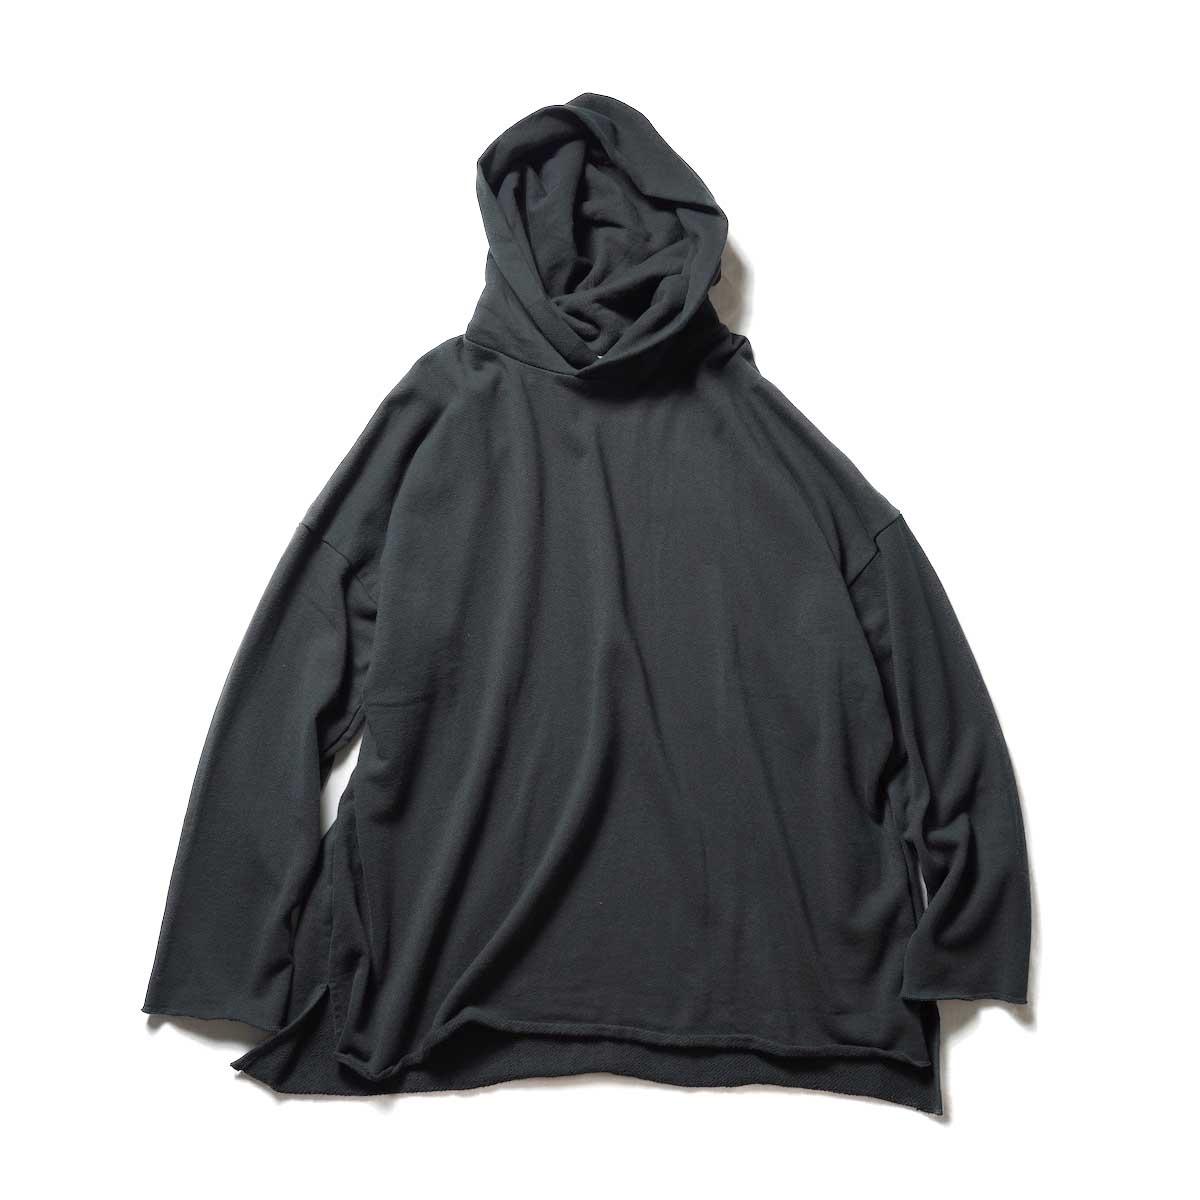 alvana / Ultimate Cut Off Parka (Black)